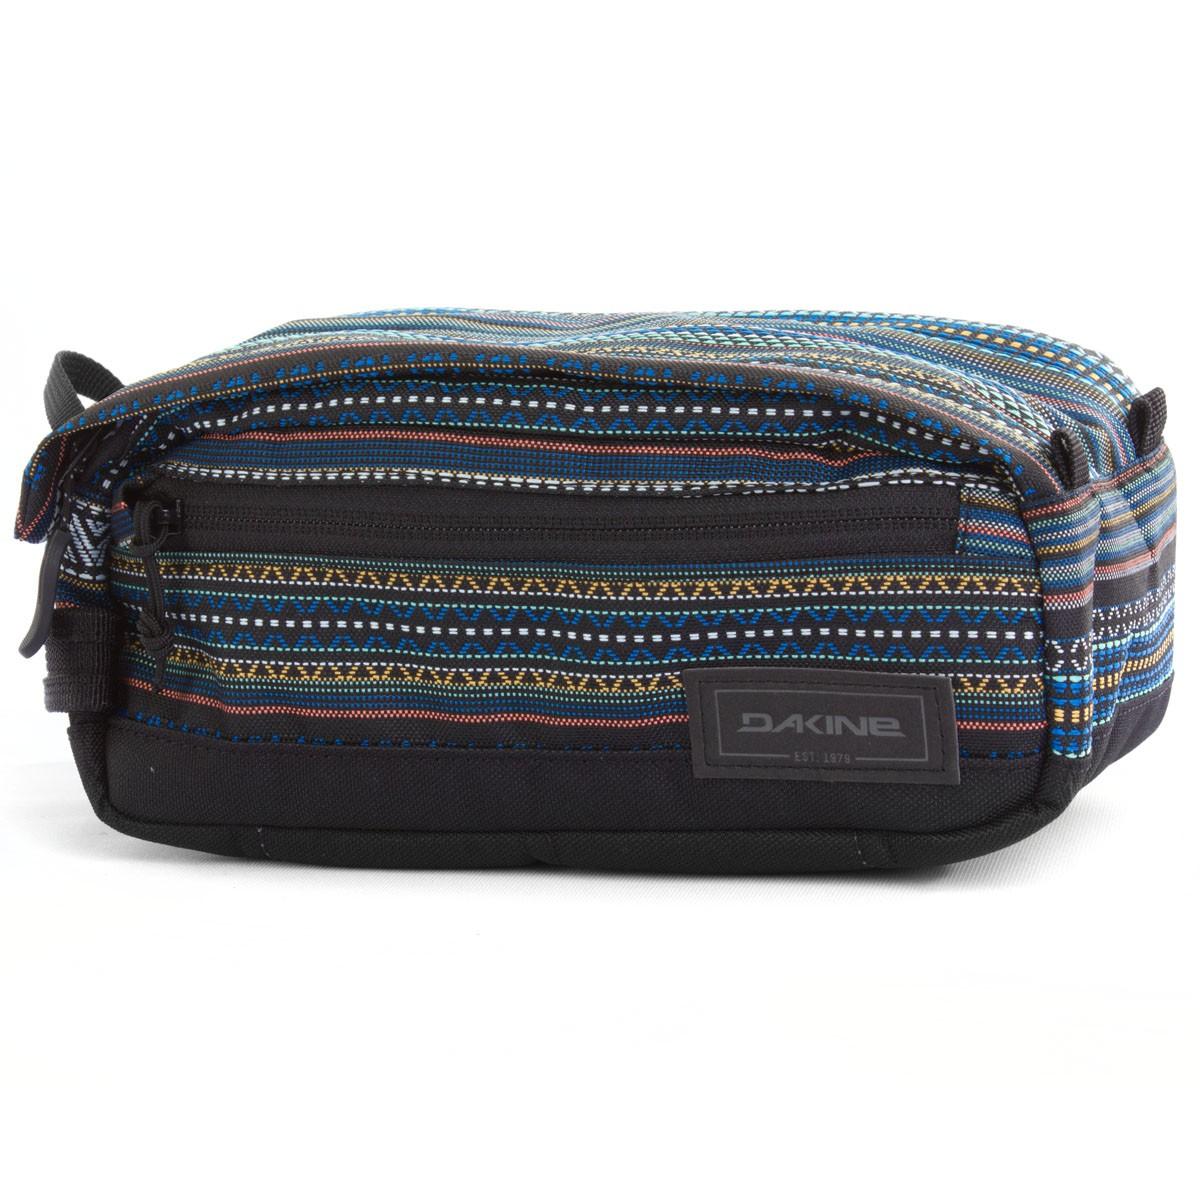 e52131560 Dakine Groomer Sm Waschbag / Beauty Case Cortez | Dakine Shop